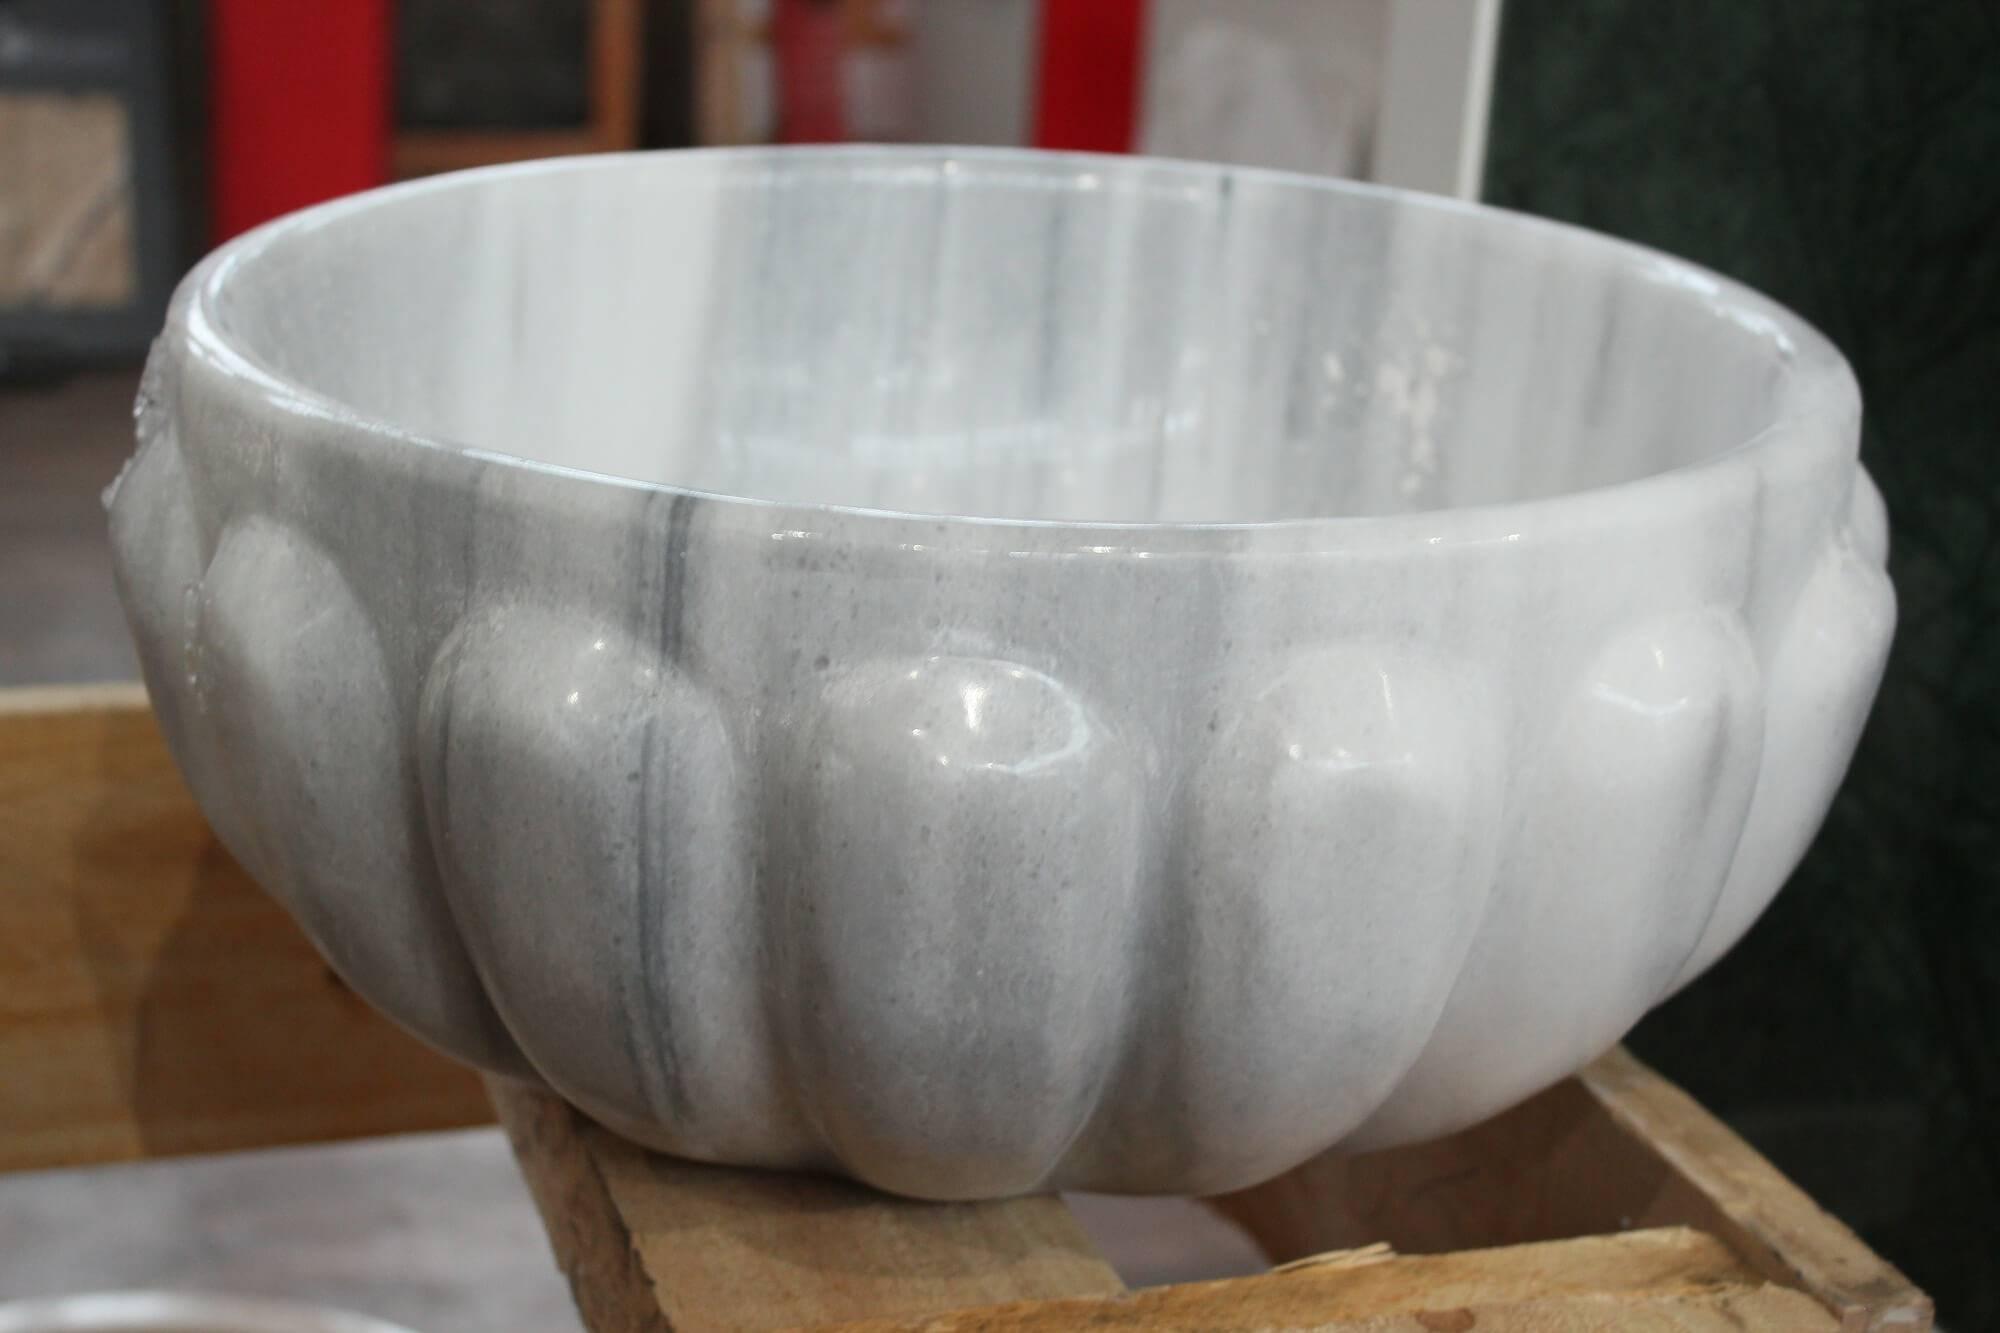 Круглая курна из мрамора, Турция фото 1 — изелия и проекты от Bevers Marmyr